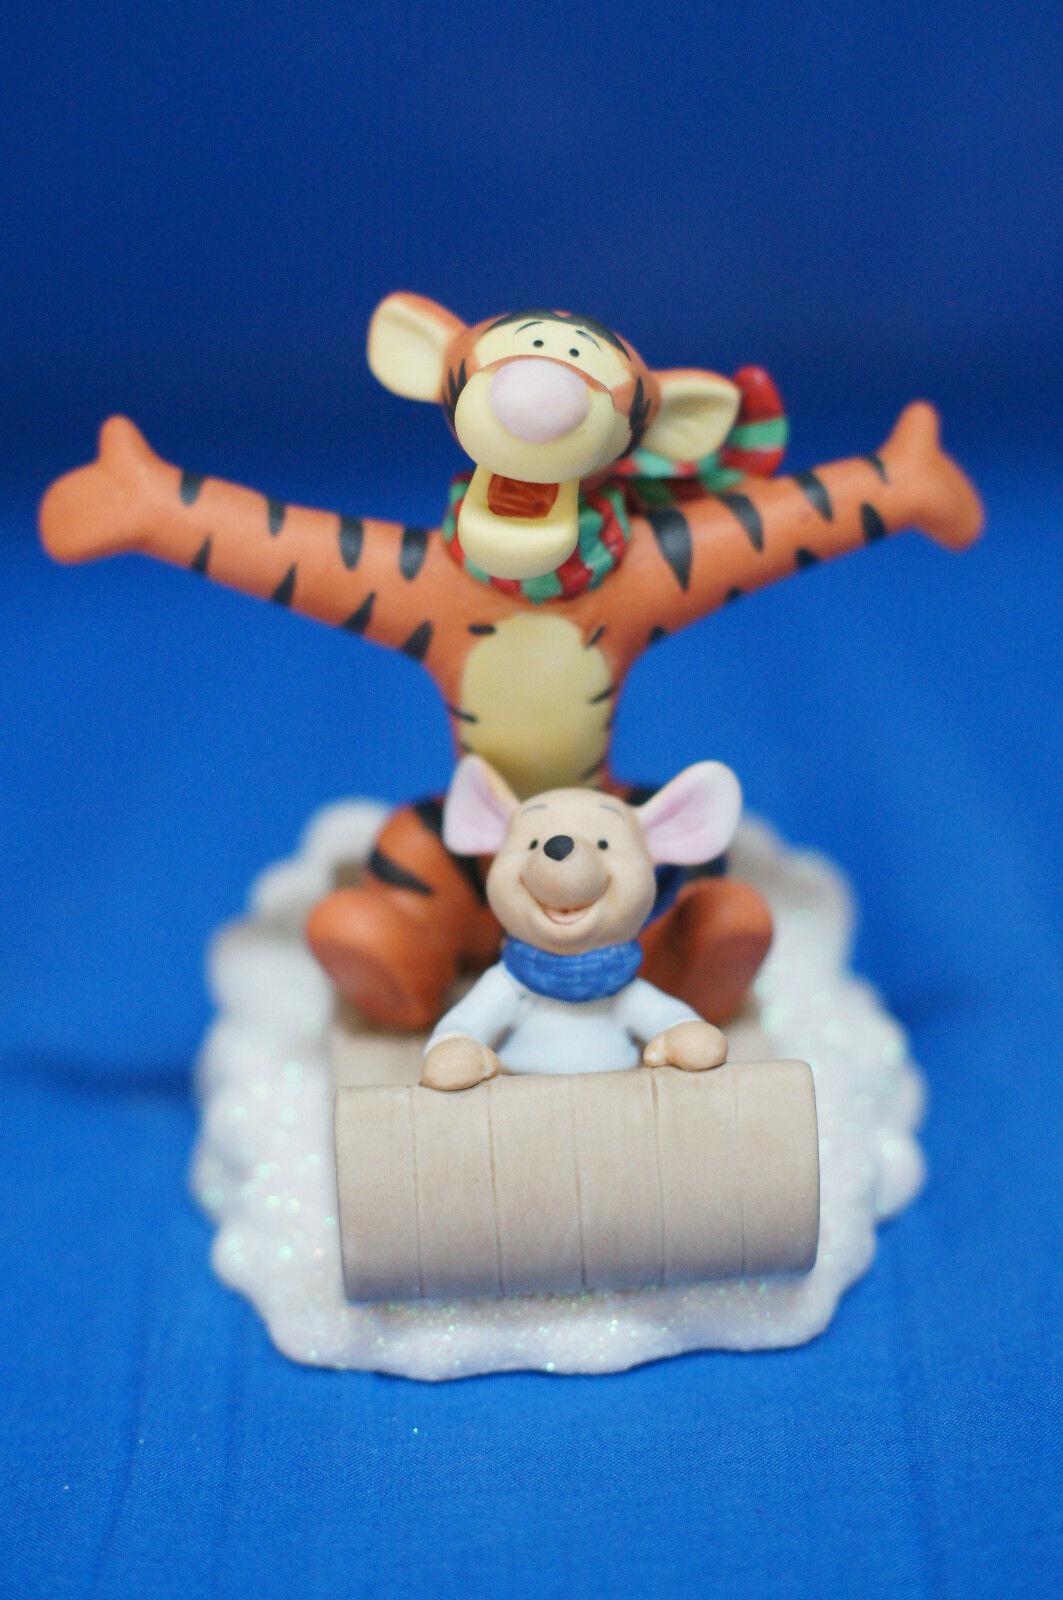 Winnie Pooh Tigger Roo You Make Life Fun Disney Precious Moments Figurine 121702